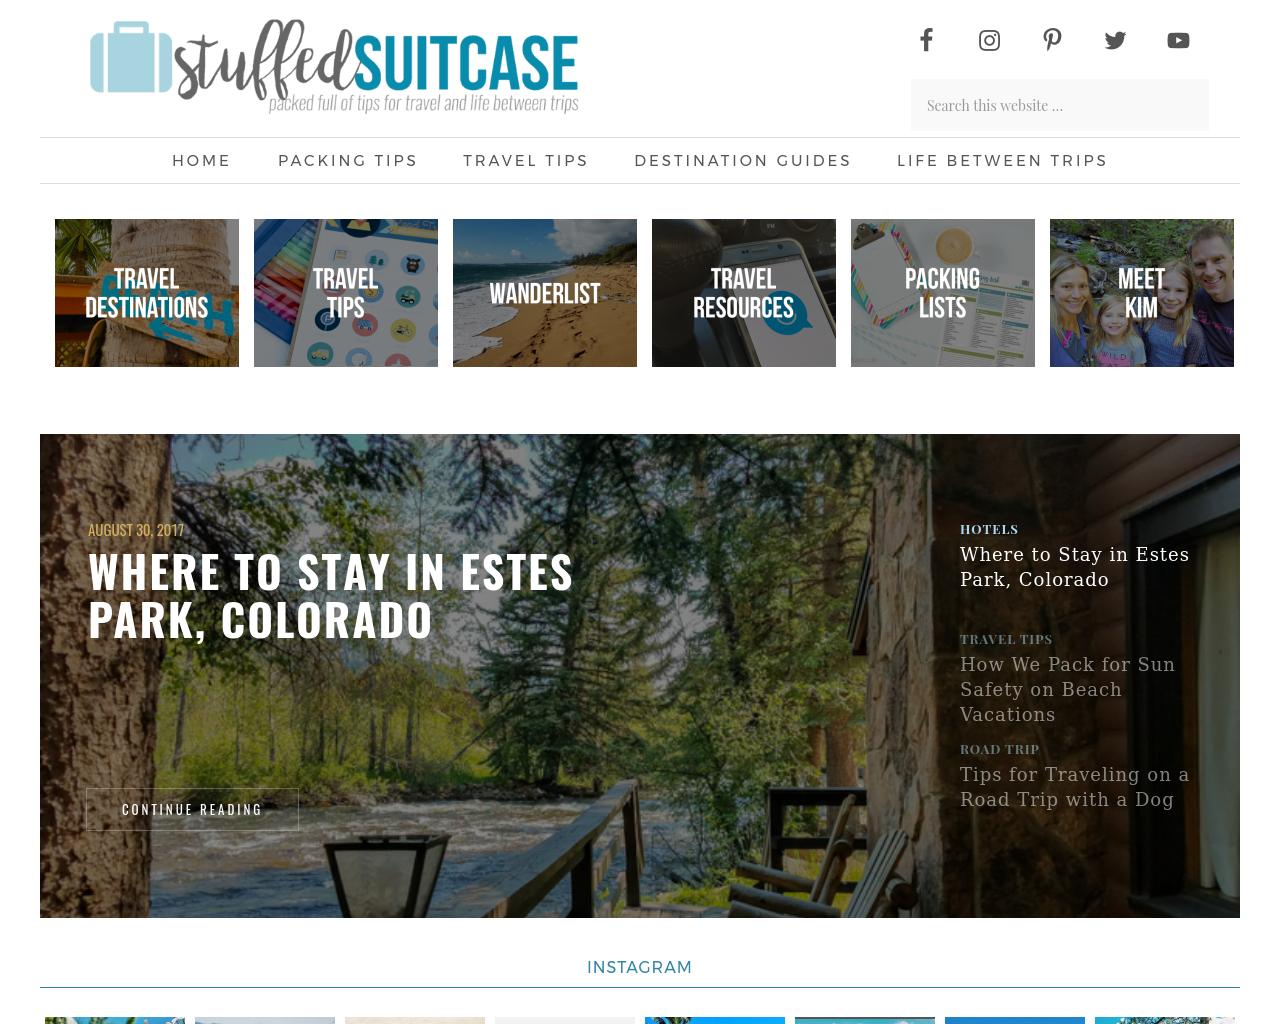 stuffedsuitcase-Advertising-Reviews-Pricing